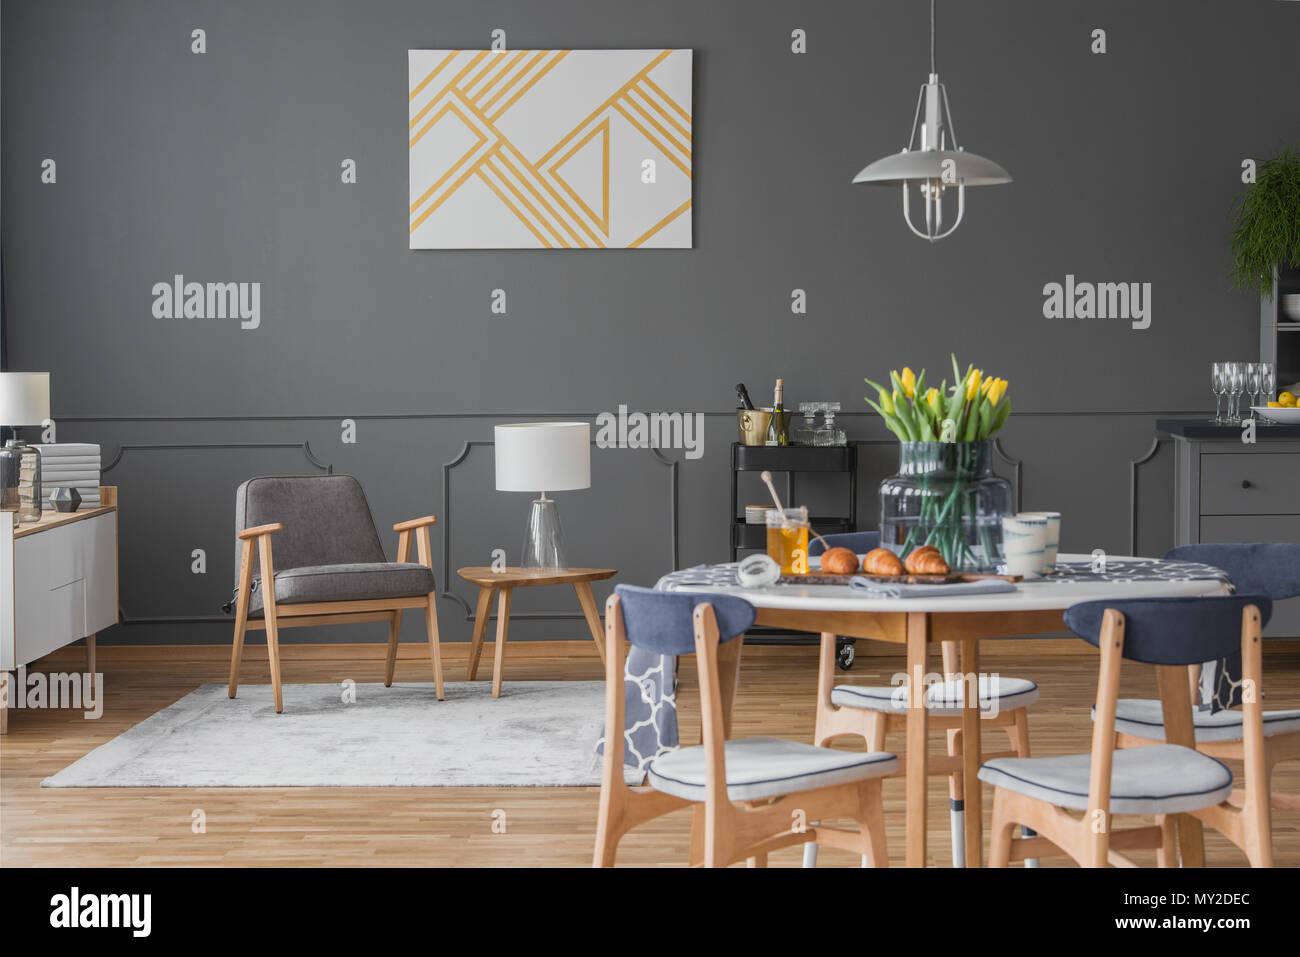 Gelbe Anstrich Auf Graue Wand Uber Holz Sessel In Geraumige